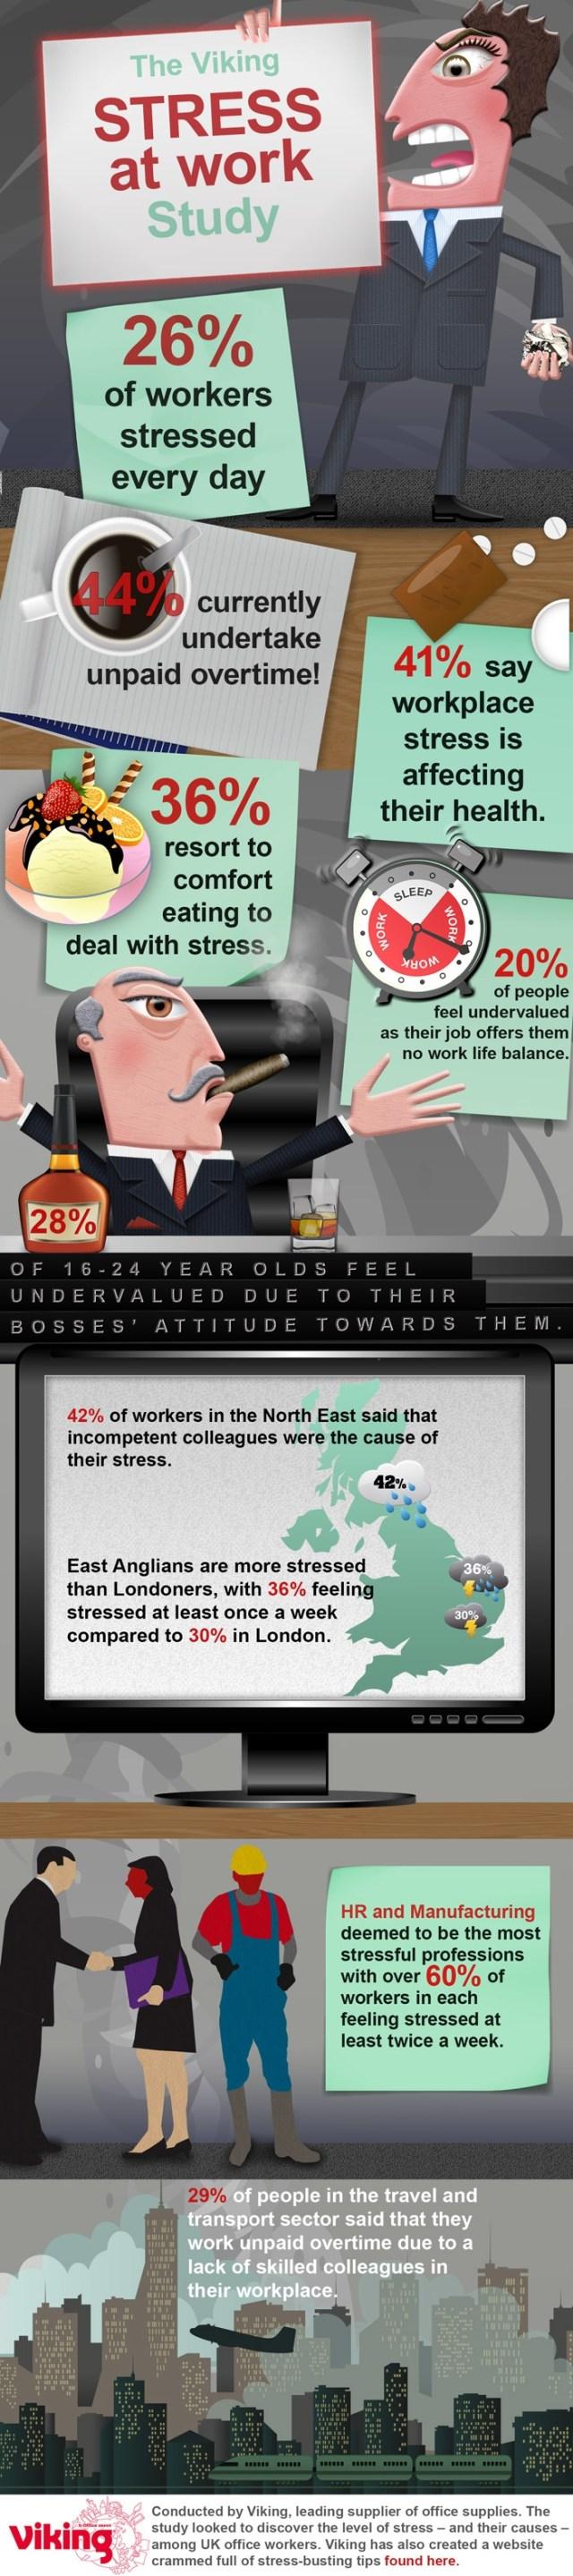 Viking-Stress-UK-Infographic